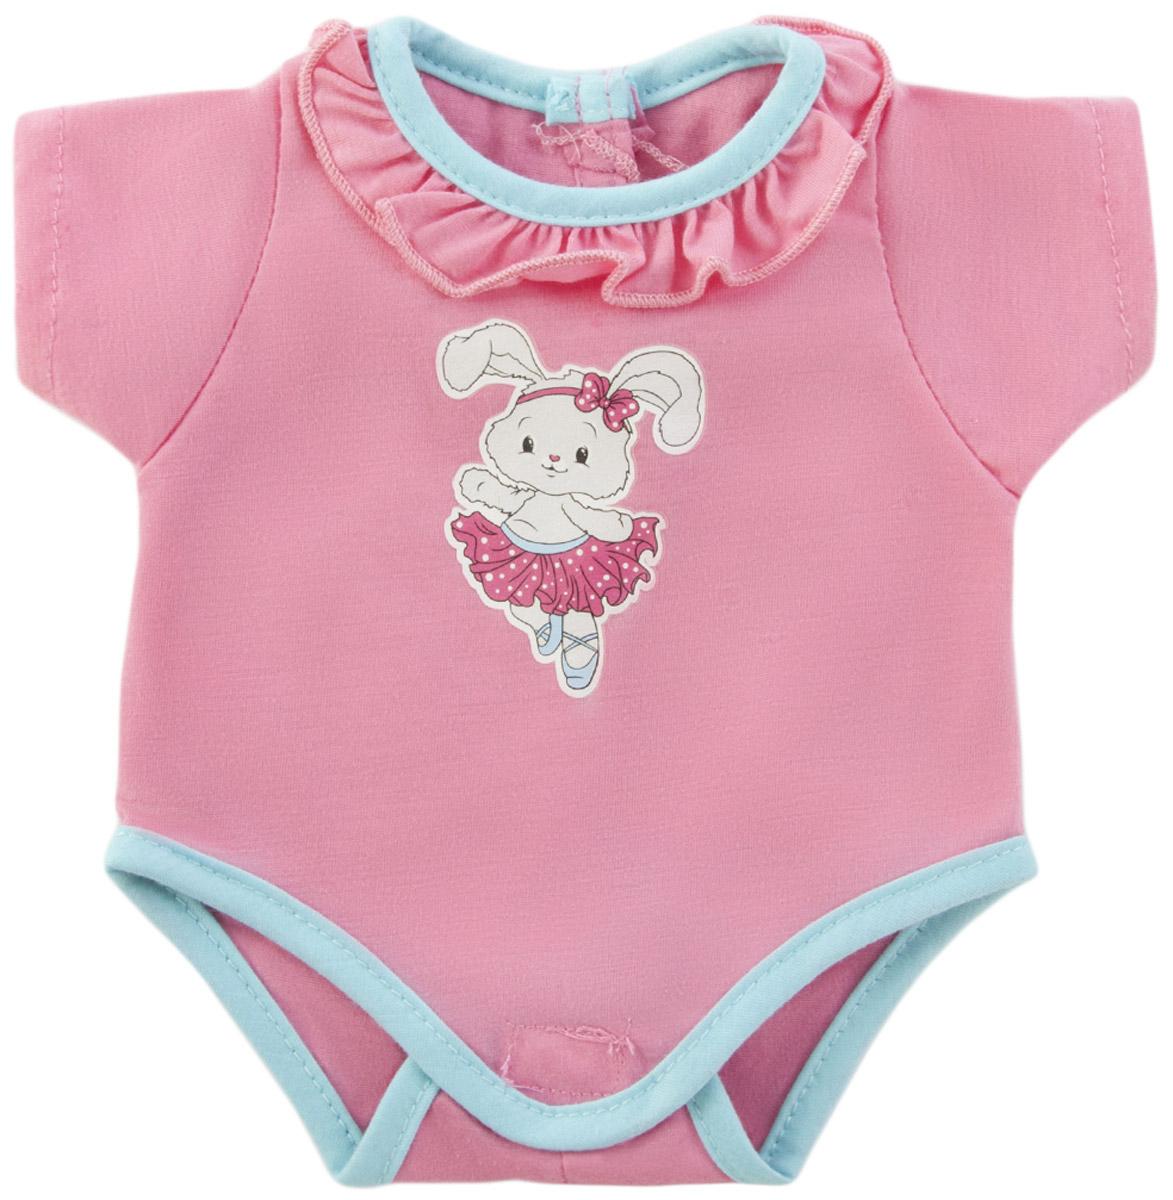 Mary Poppins Одежда для кукол Боди Зайка одежда для кукол 40 42 см розовый боди